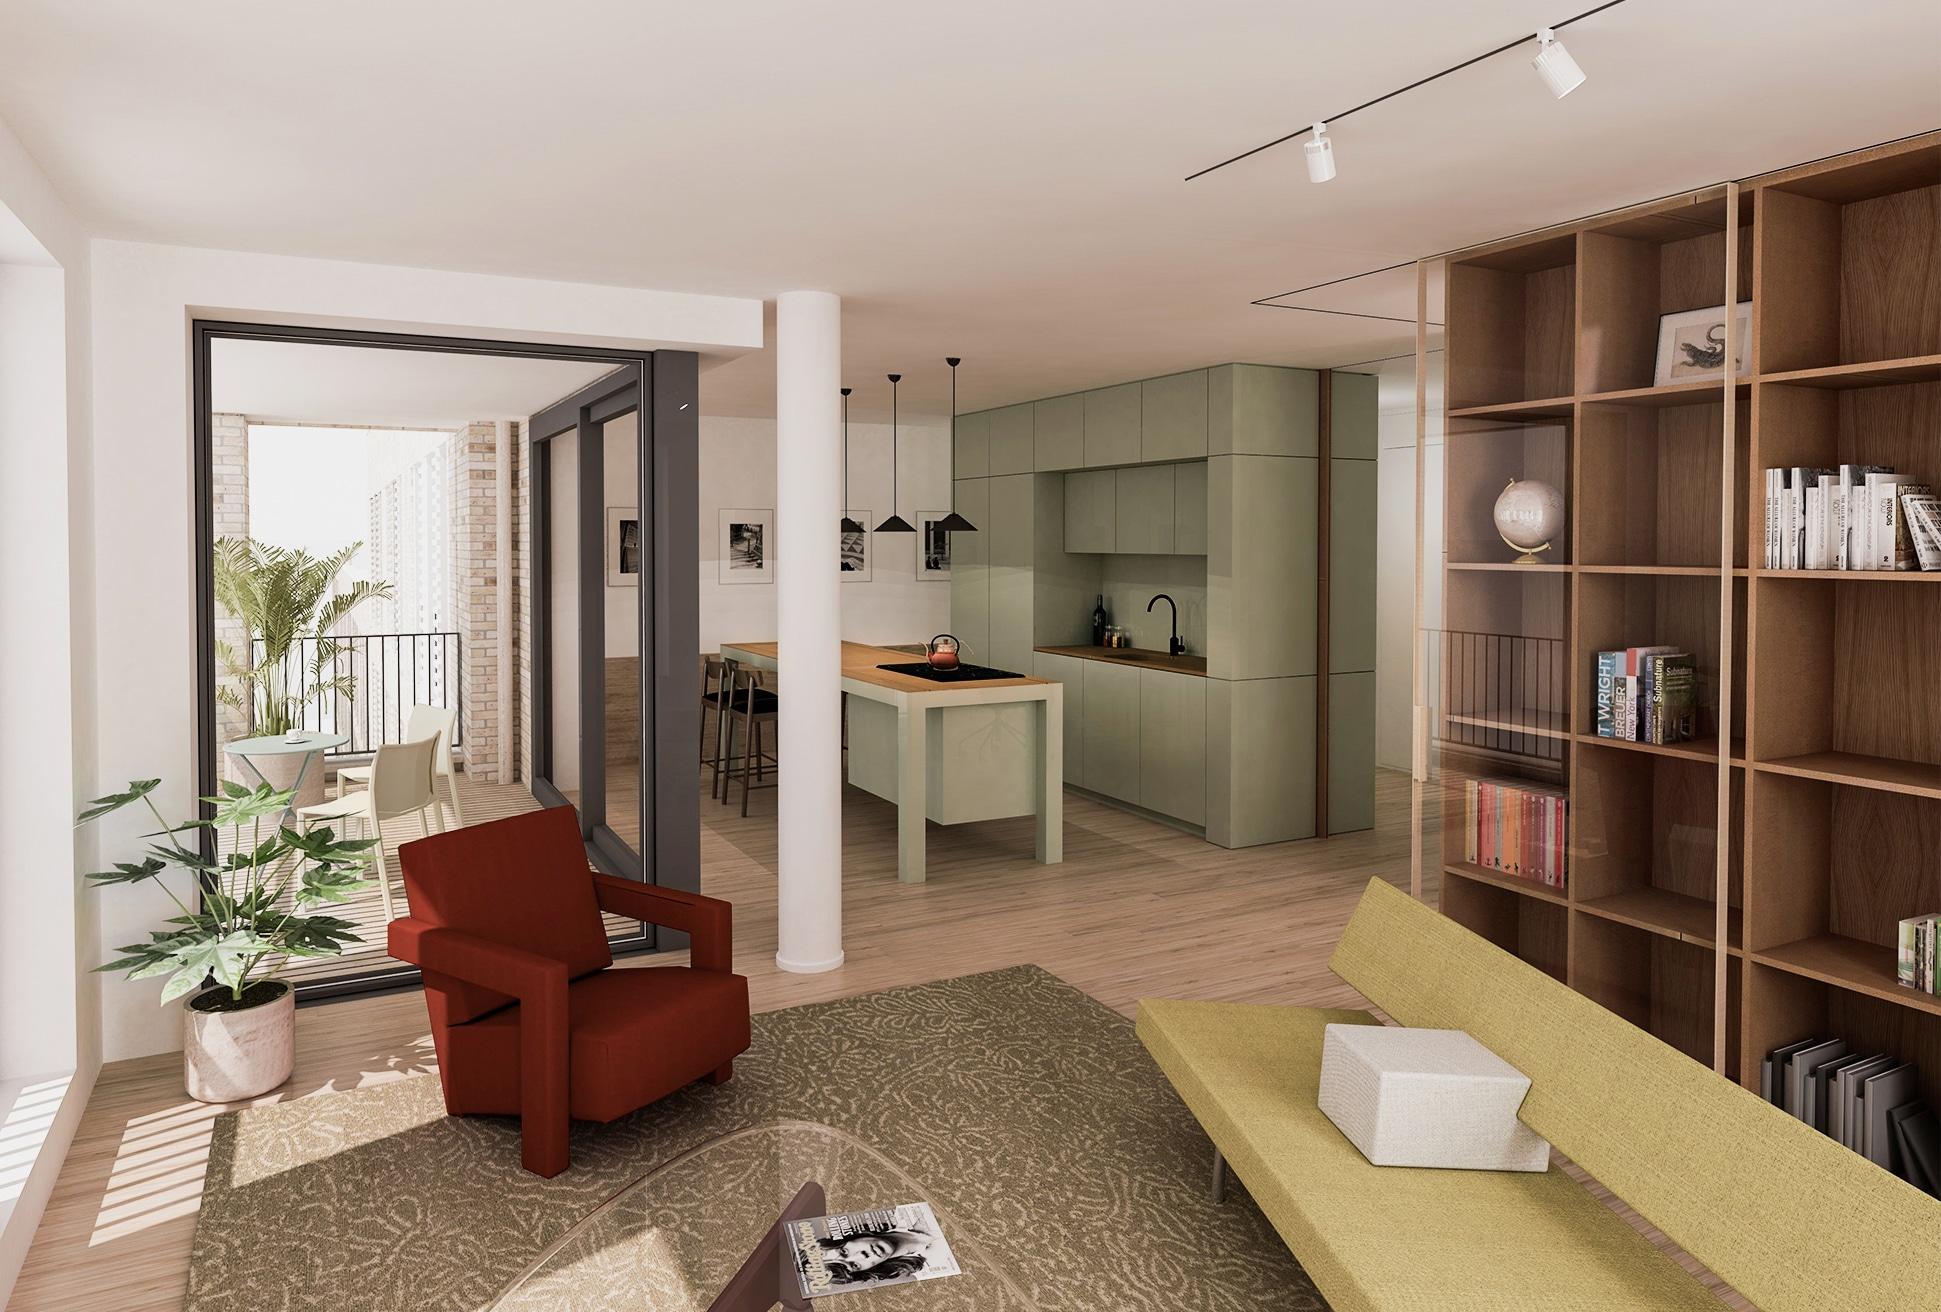 Poortmeesters interieurs 3-kamer appartement